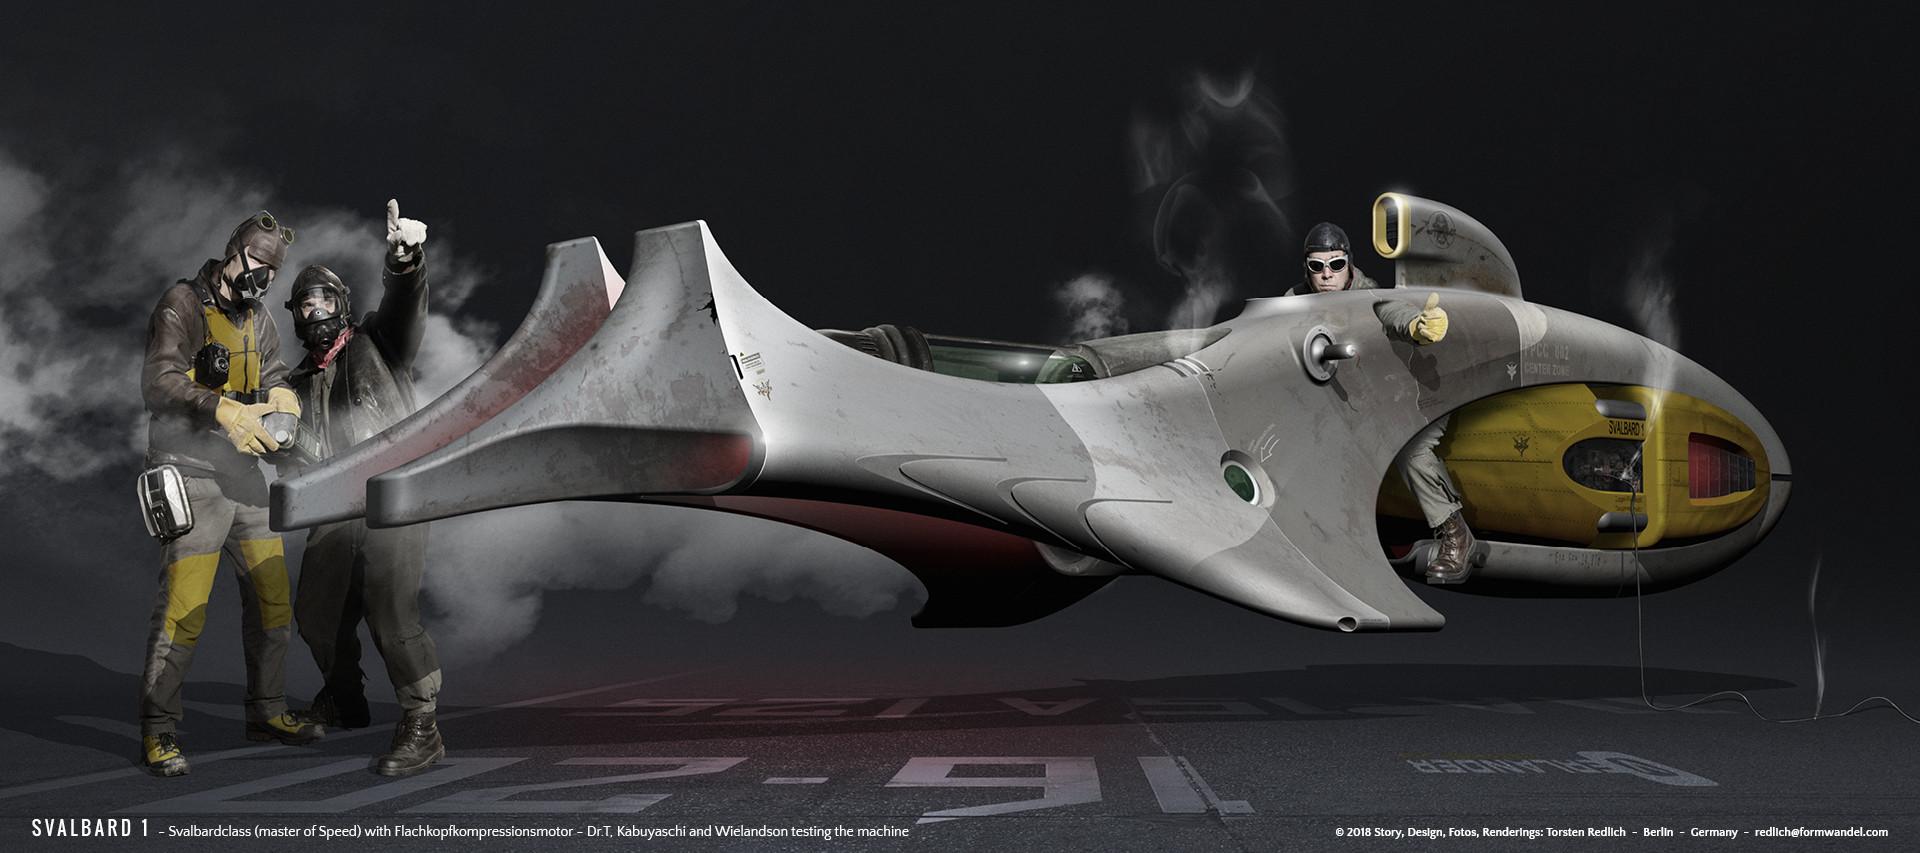 Svalbard 1 - master of Speed